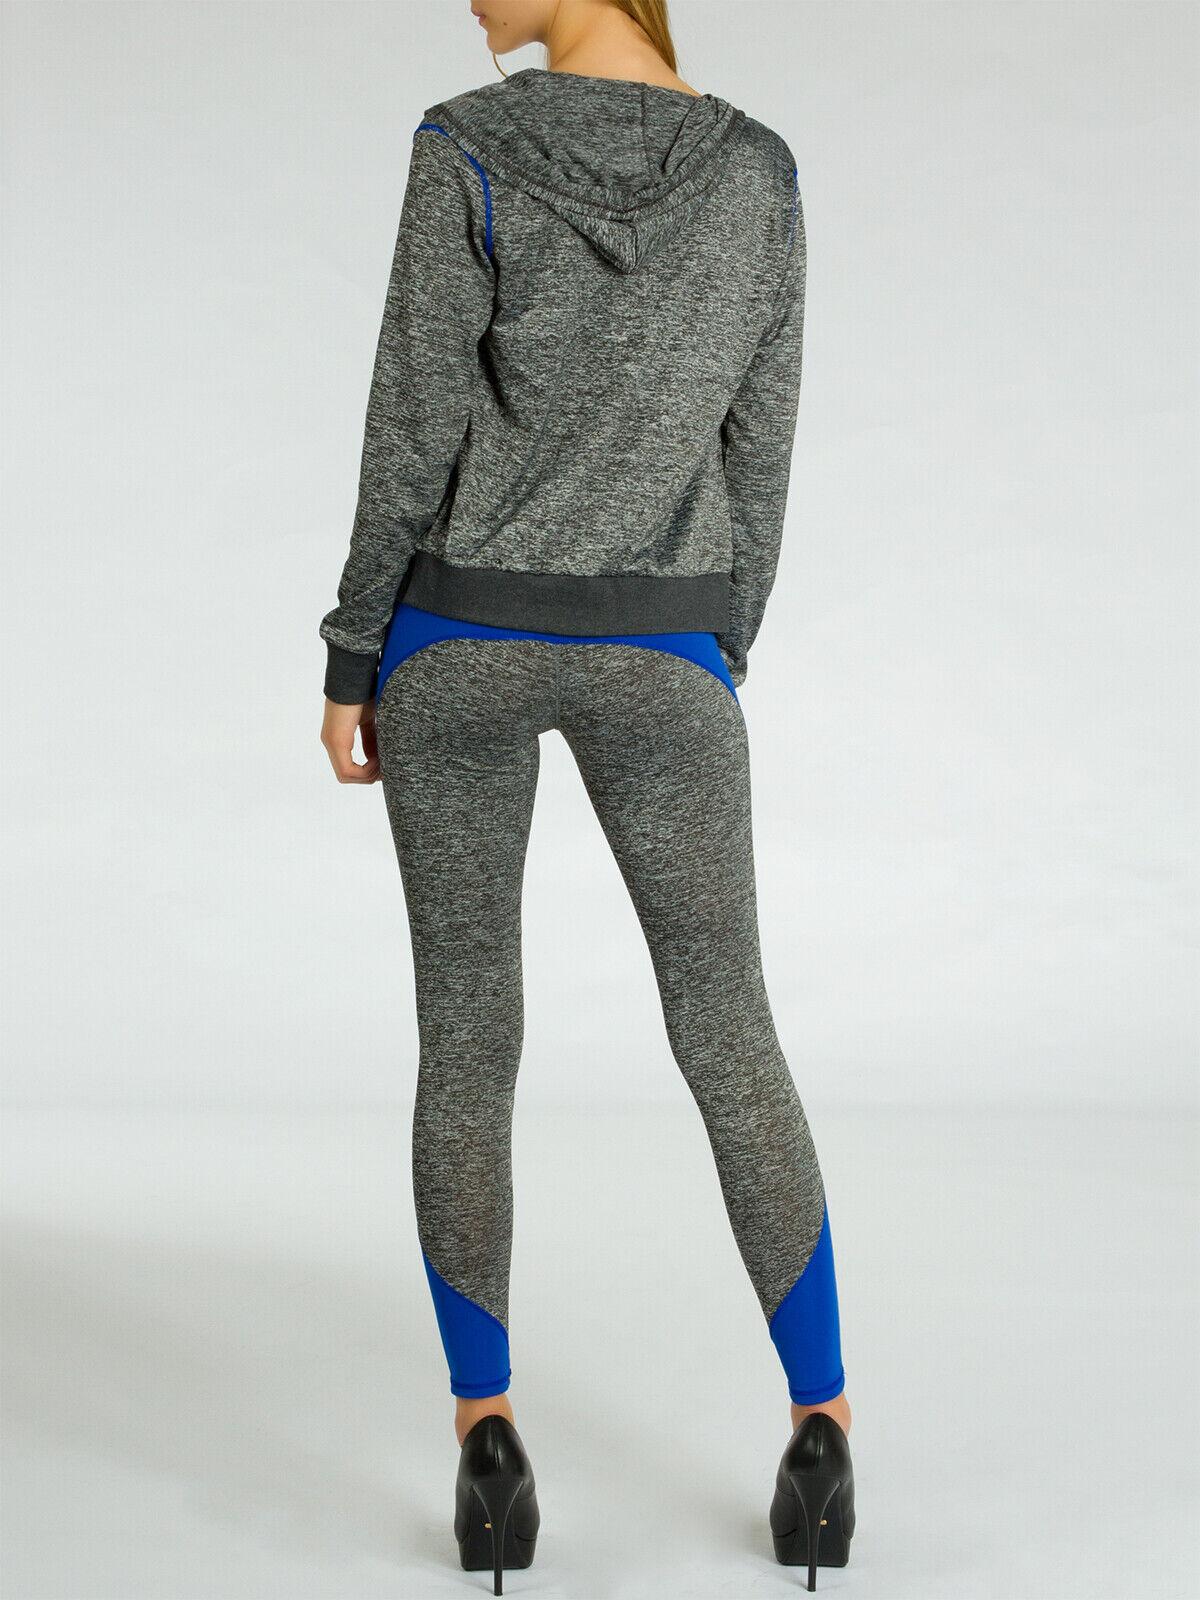 CASPAR JG001 Damen Jogginganzug Trainingsanzug Jogginghose Jacke Fitness sexy